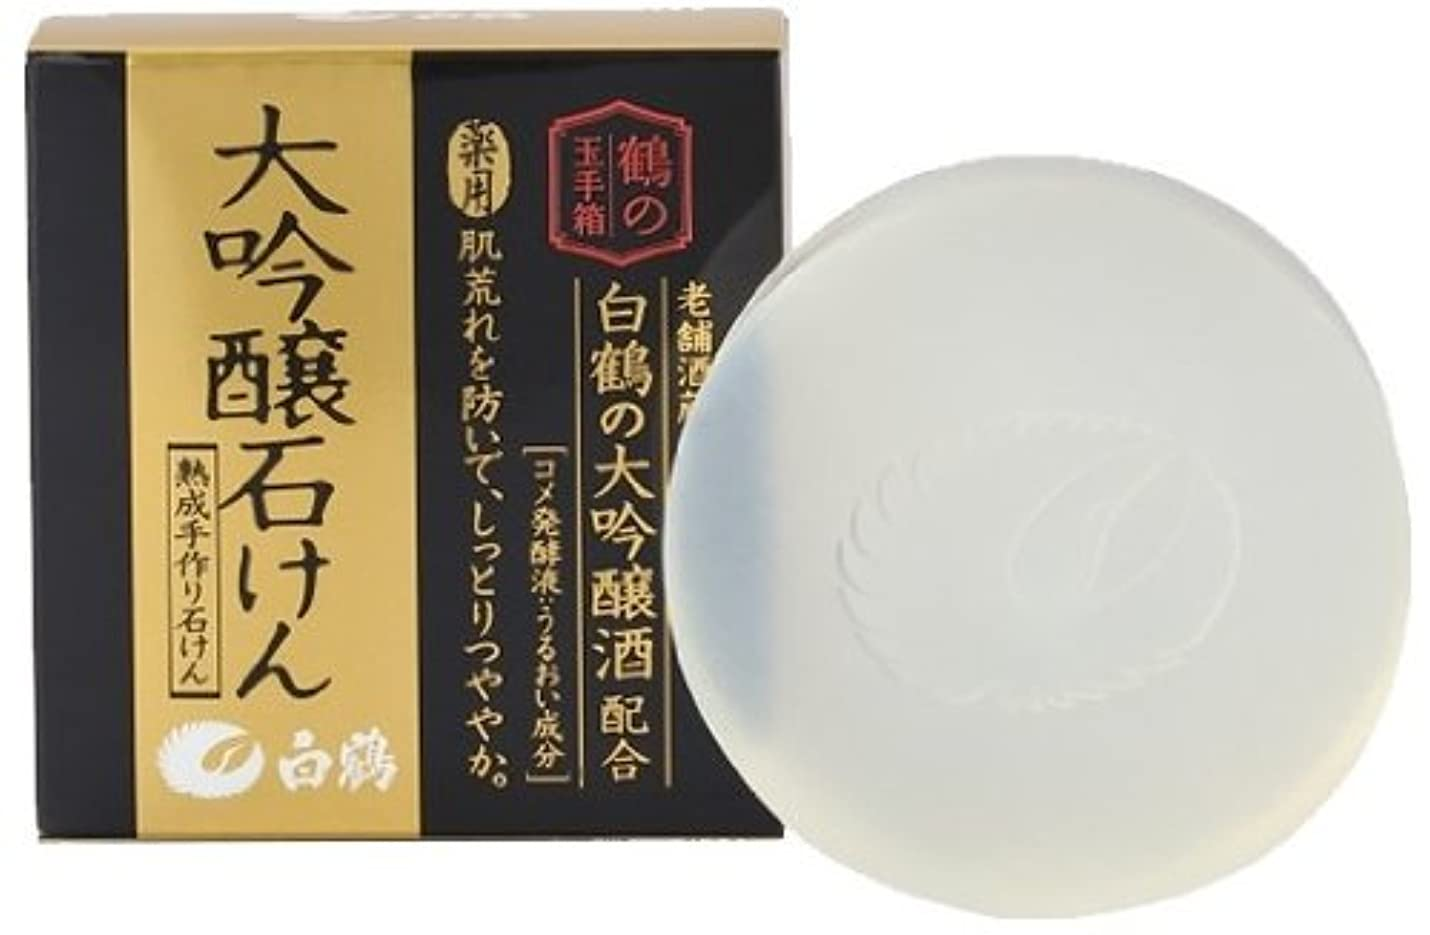 経過姓虐殺白鶴 鶴の玉手箱 薬用 大吟醸石けん 100g (医薬部外品)